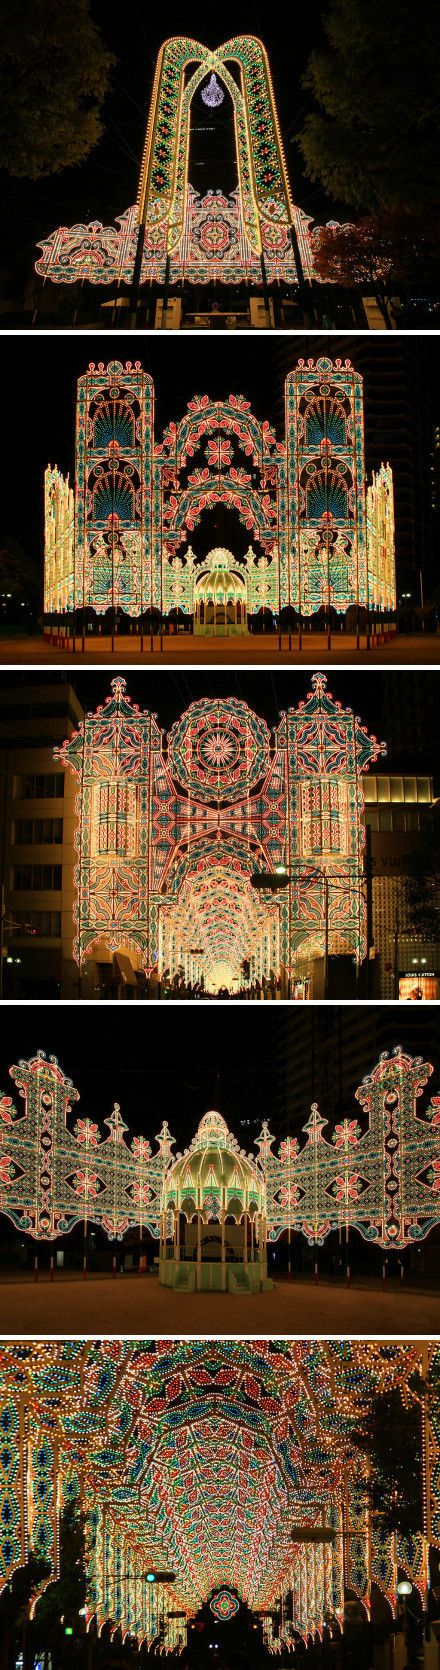 Kobe, Japan.  Kobe Luminarie Festival, in commemoration of the Great Hanshin Earthquake of 1995.